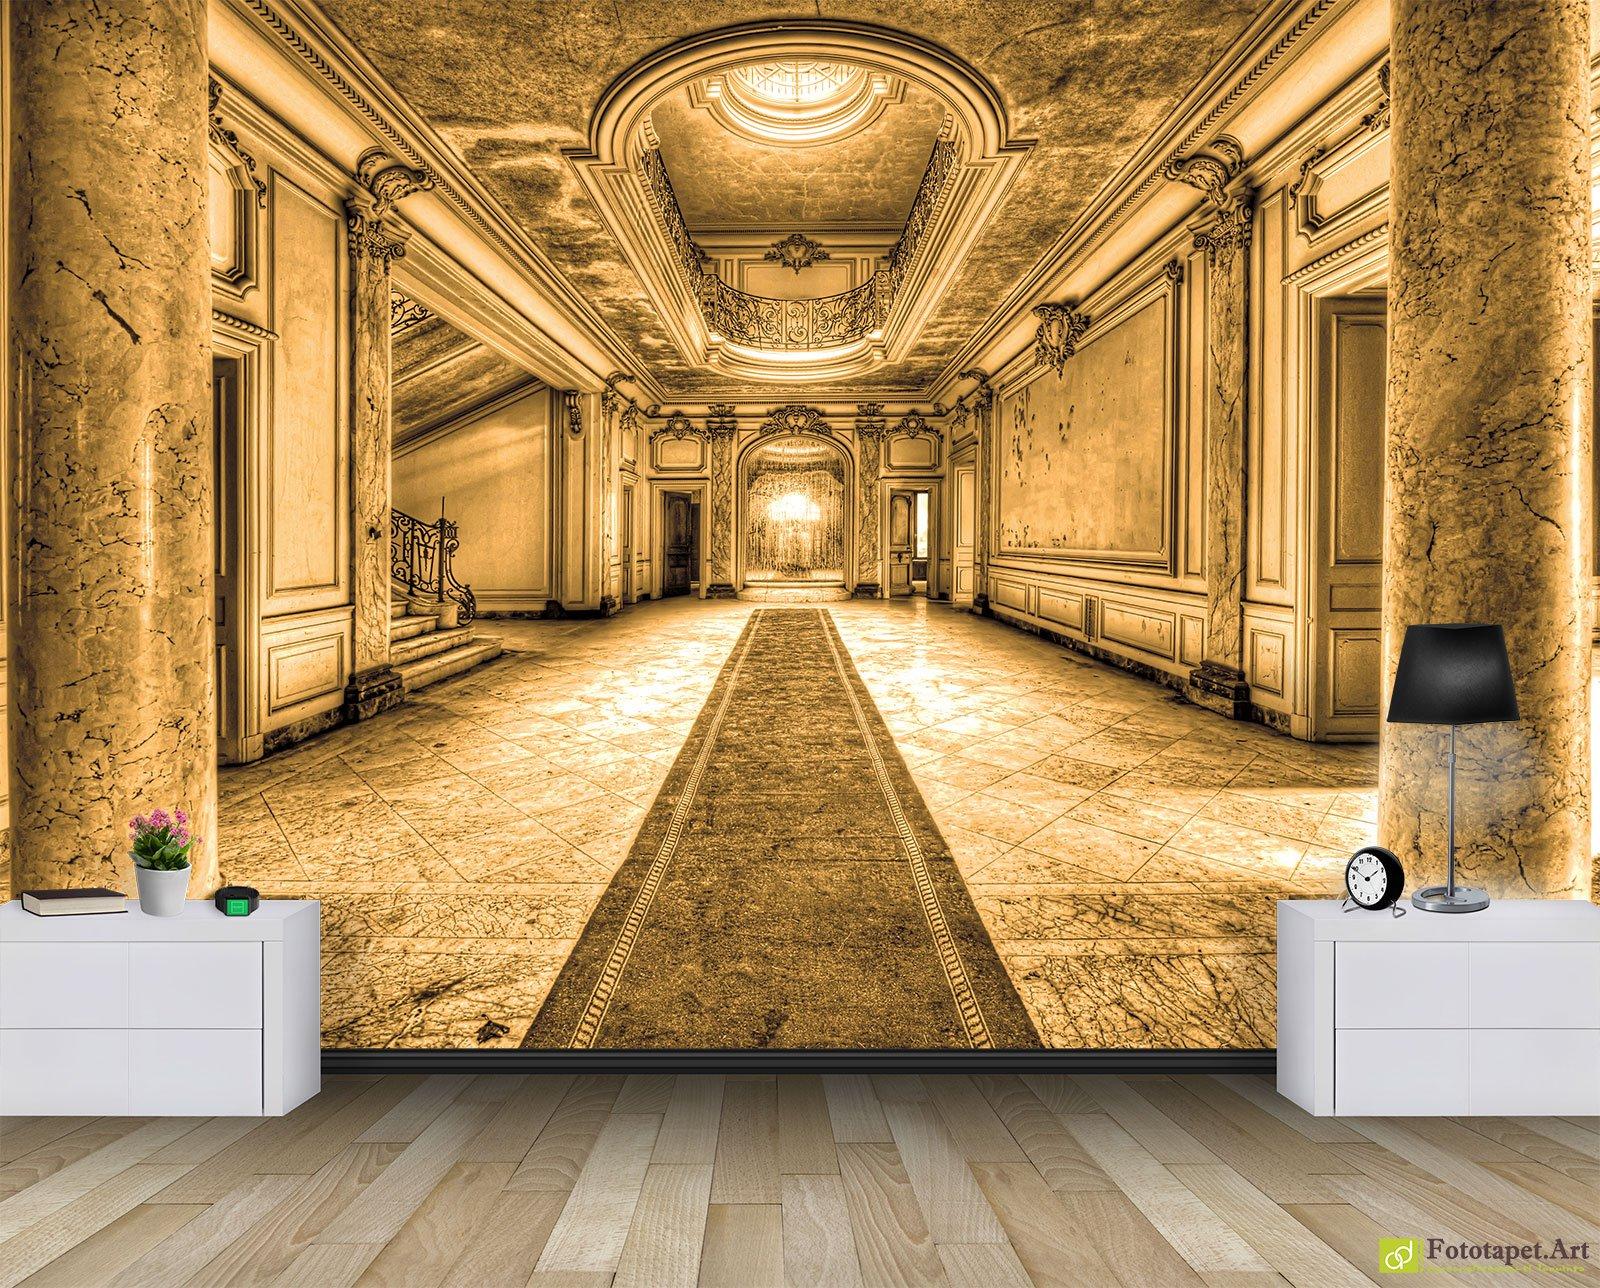 Wall Murals & Digital Wallpaper - Corridor of an abandoned palace_2 ...